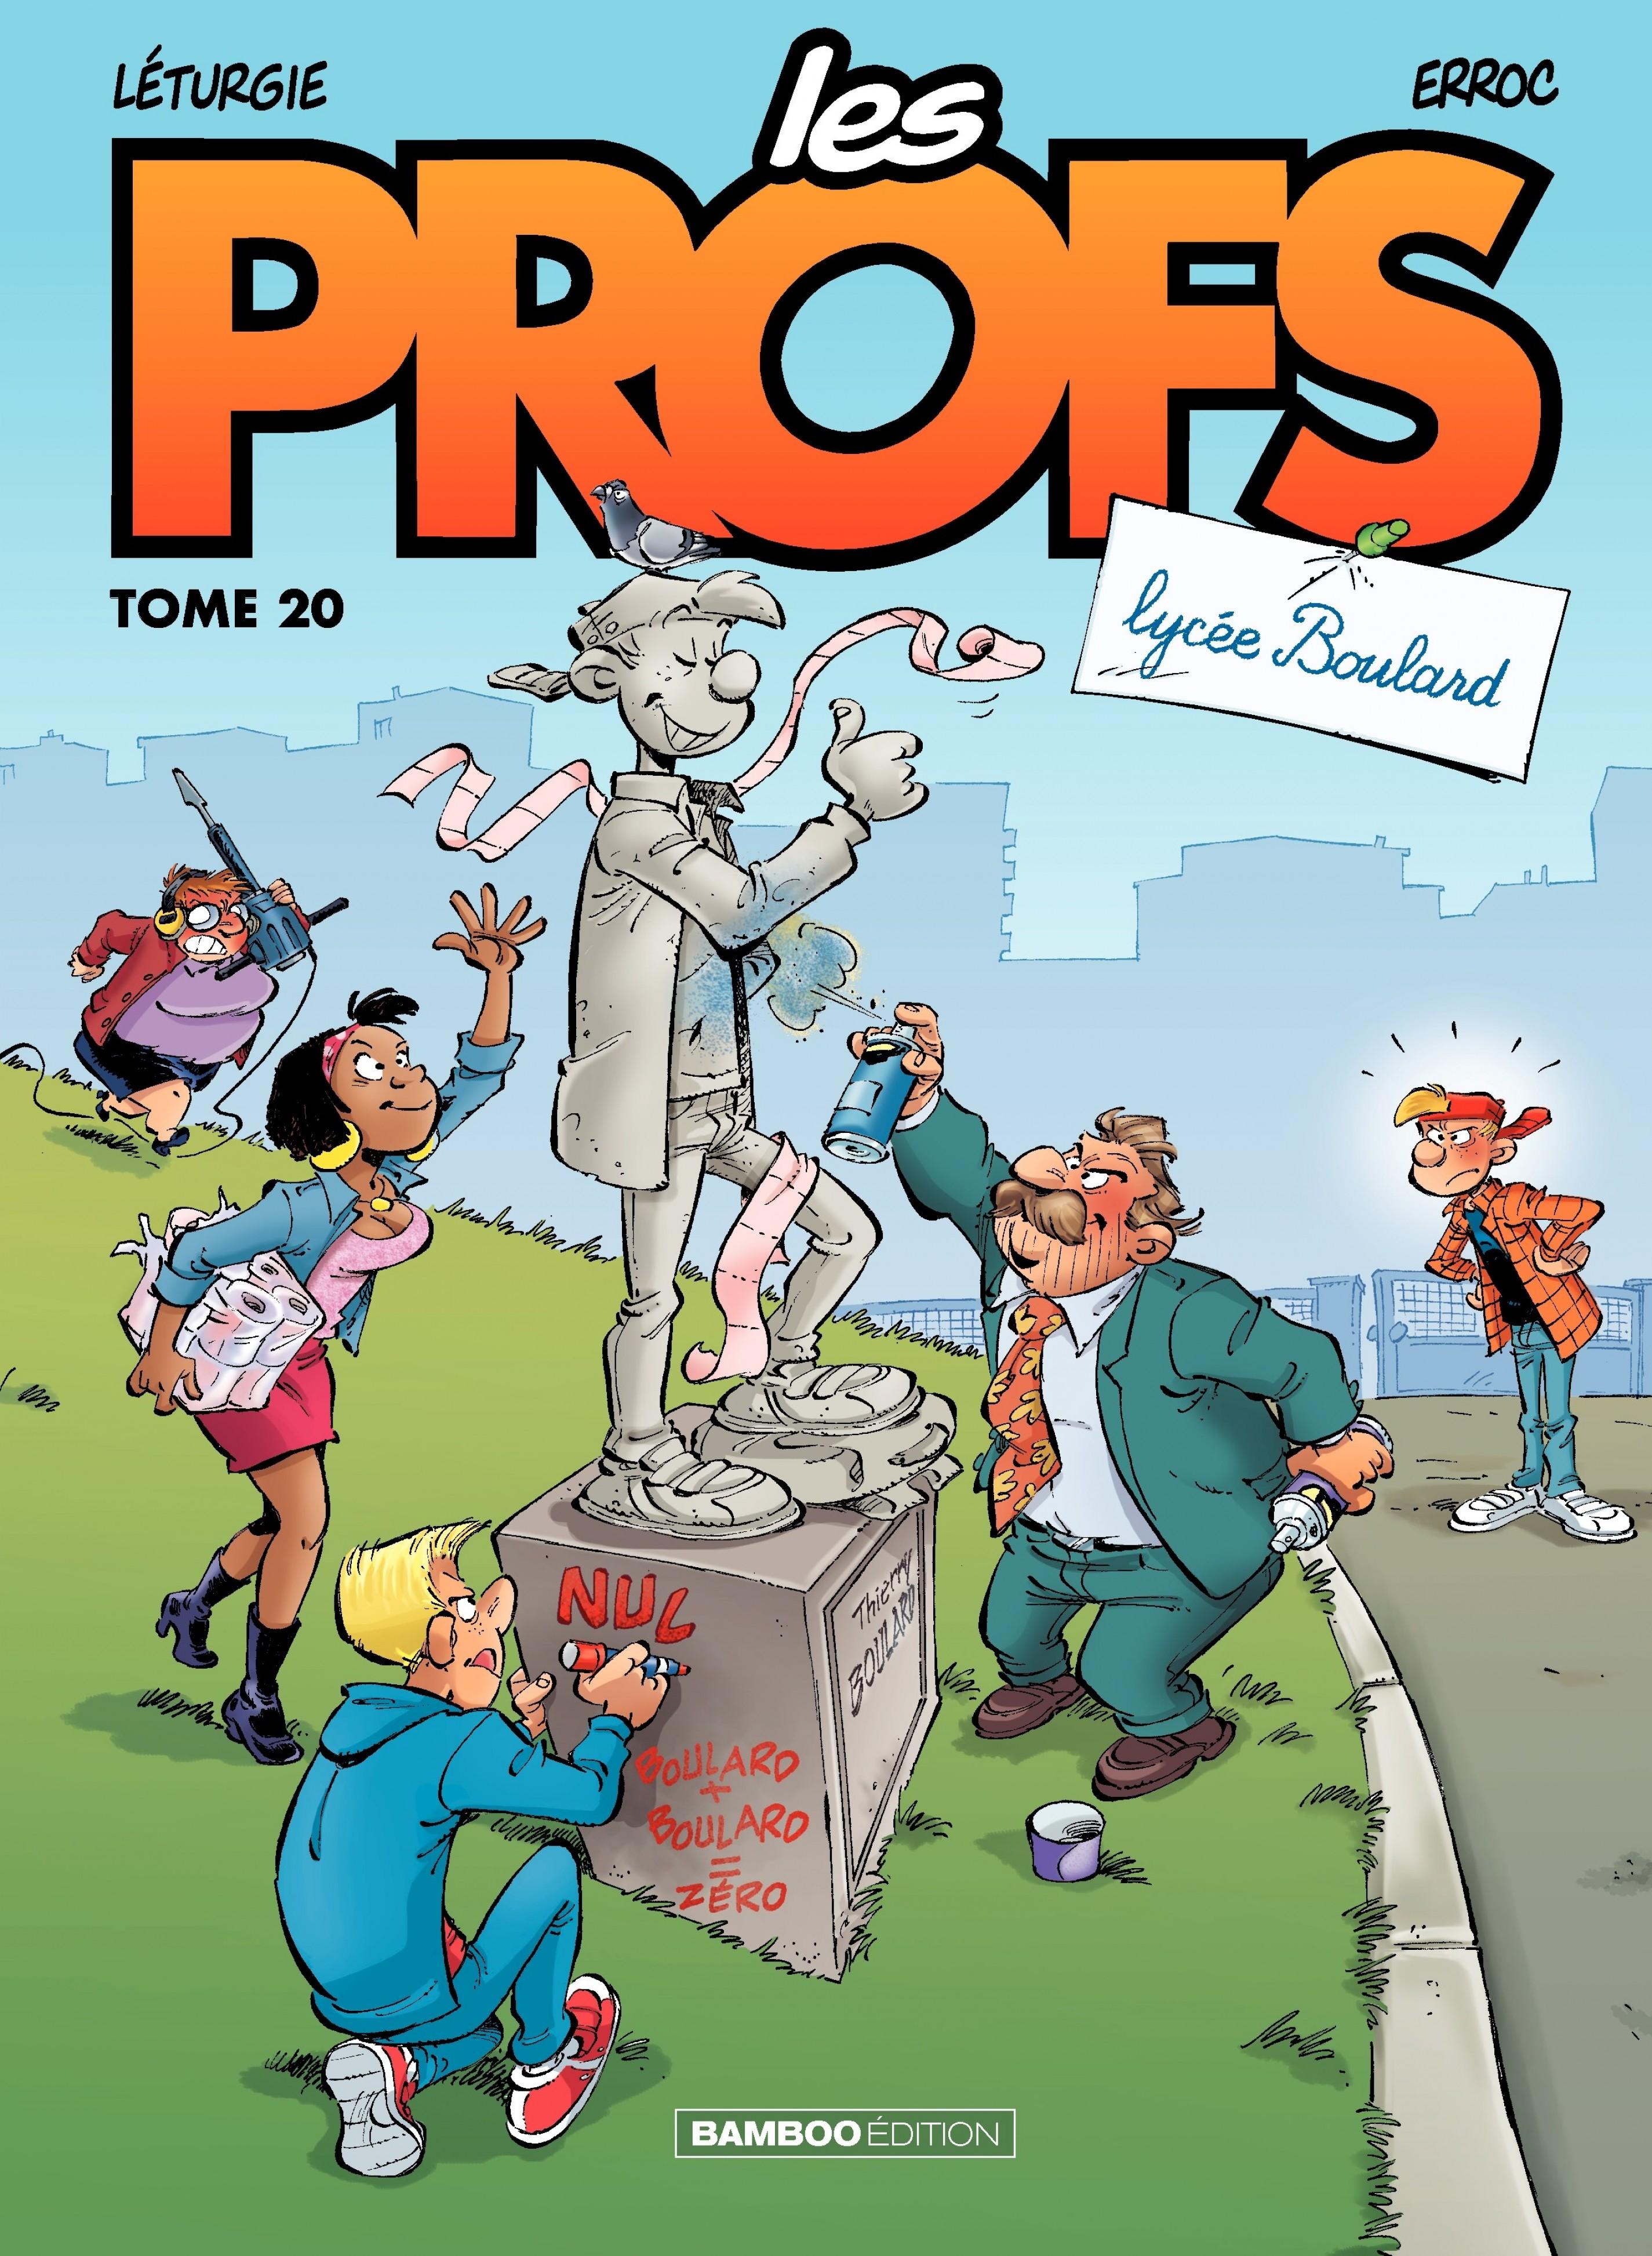 LES PROFS - TOME 20 - LYCEE BOULARD